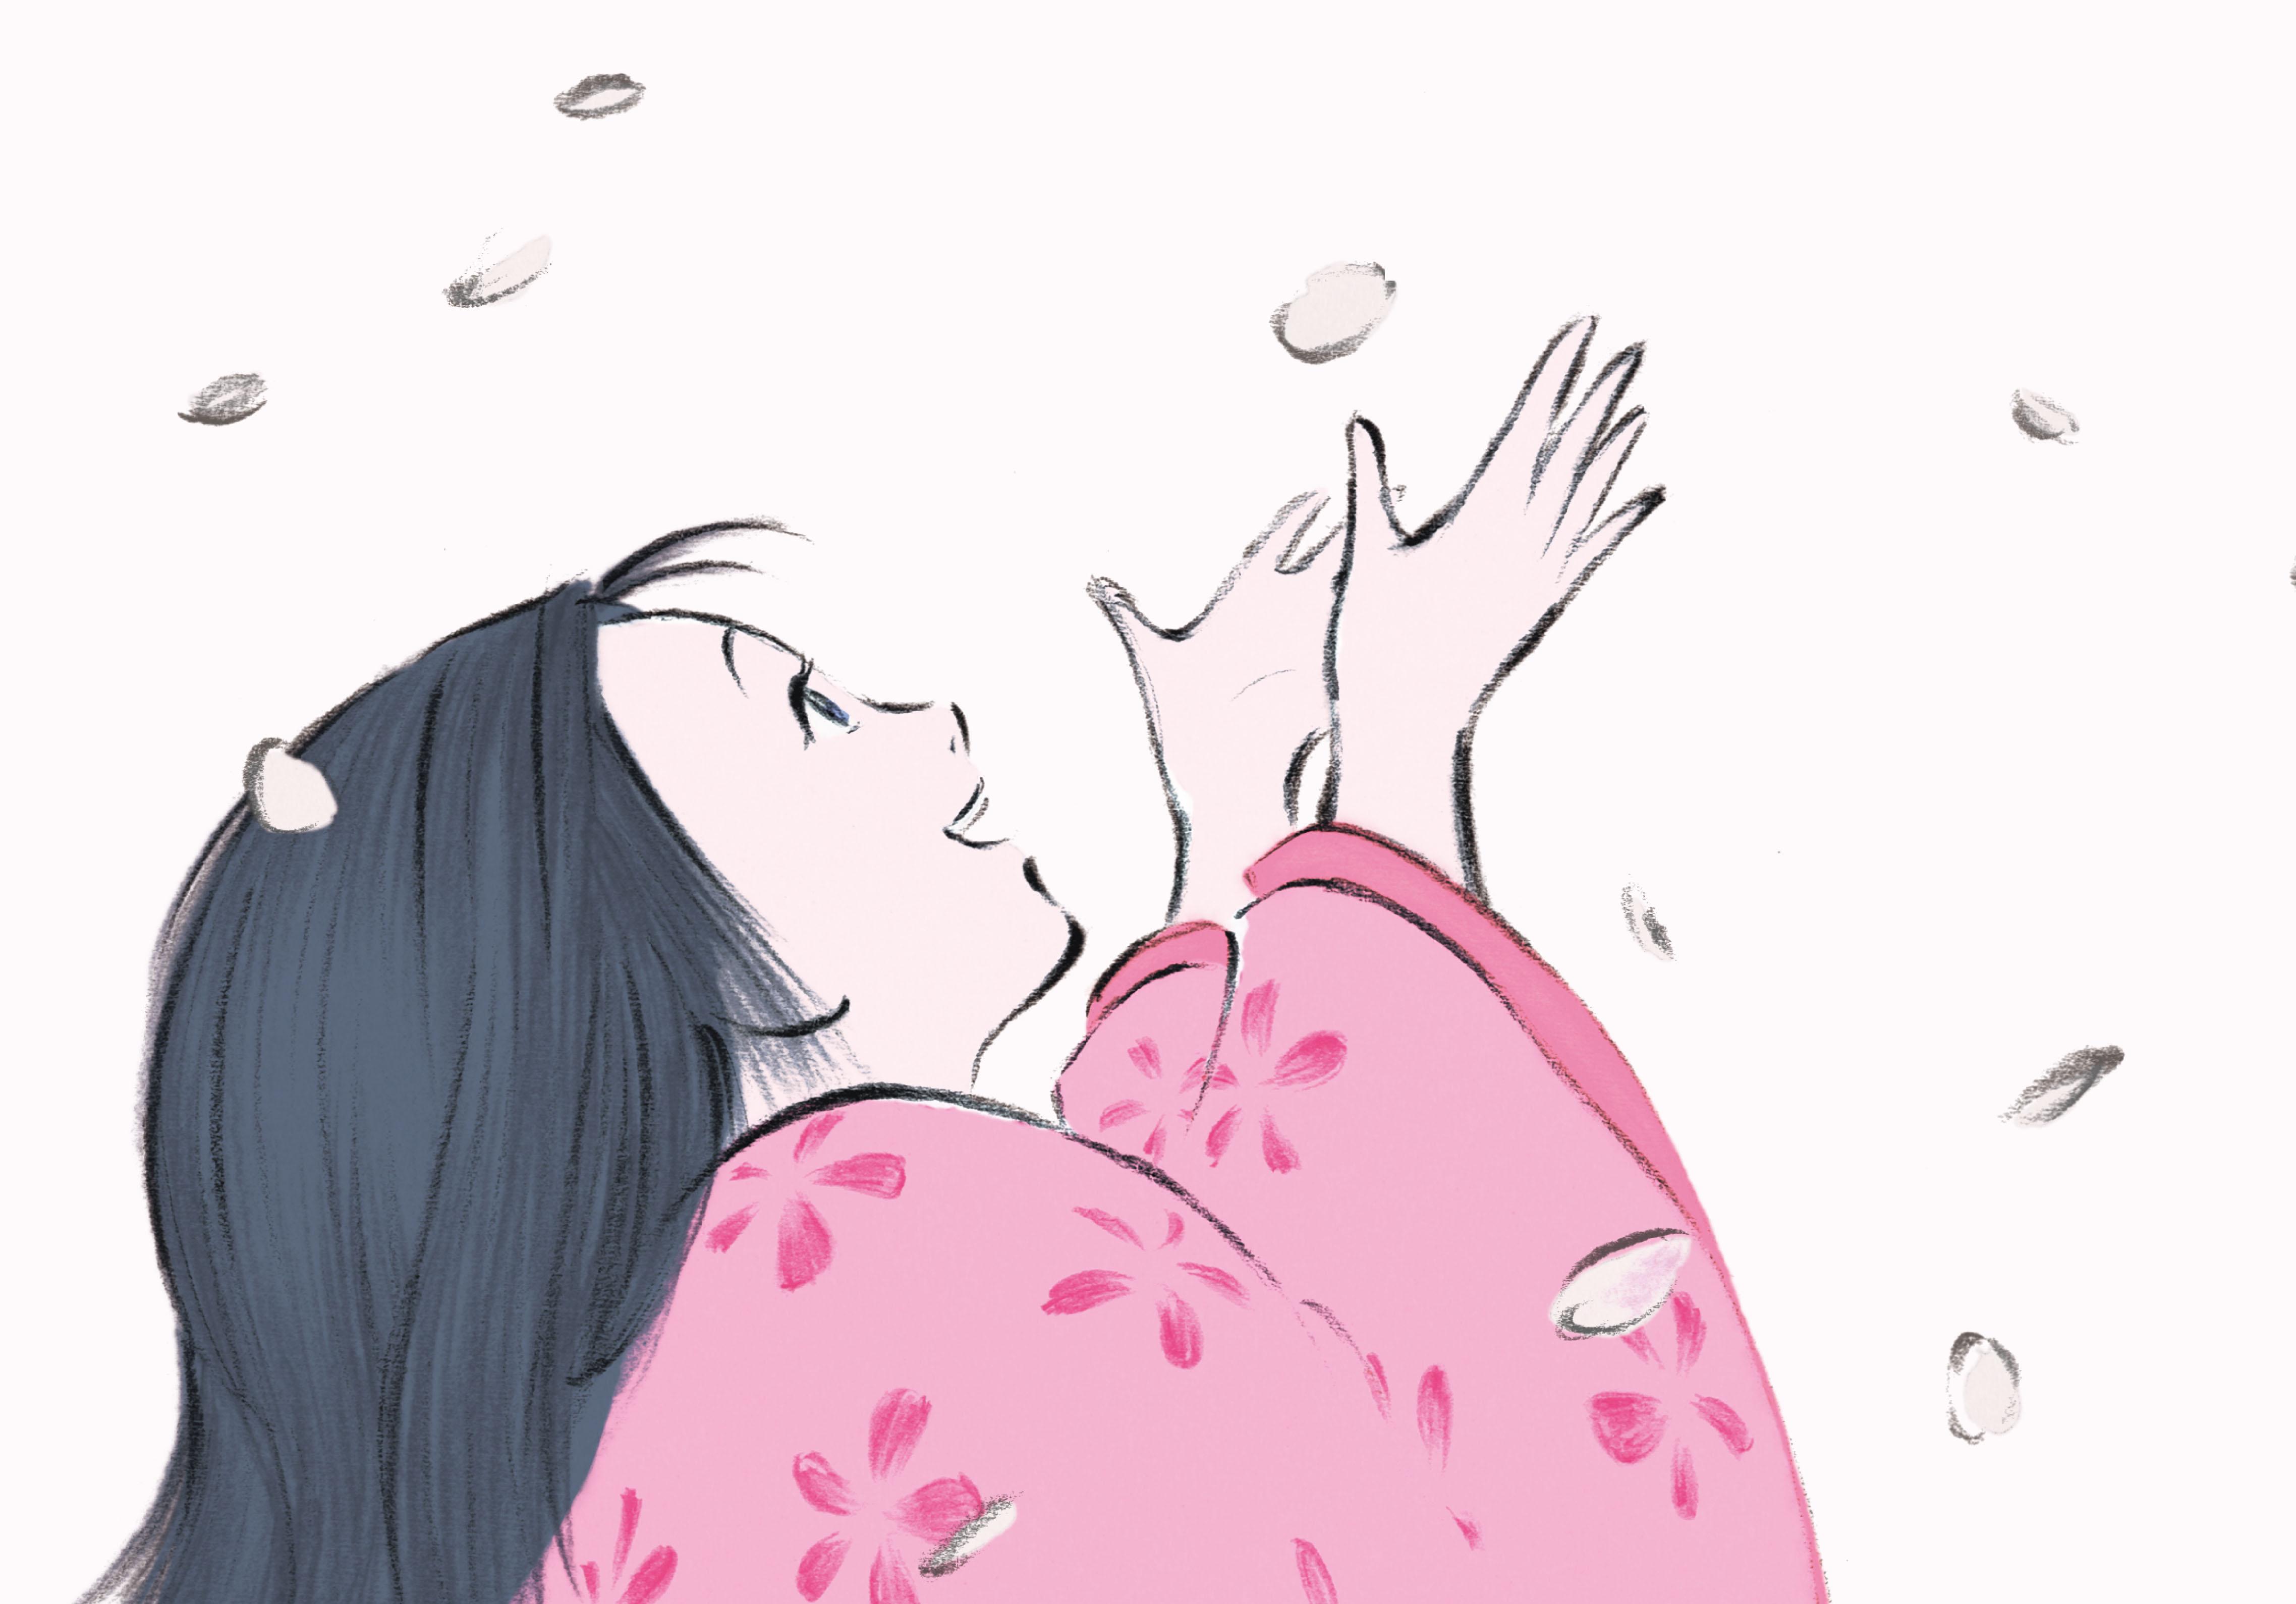 The Tale of the Princess Kaguya studio ghibli